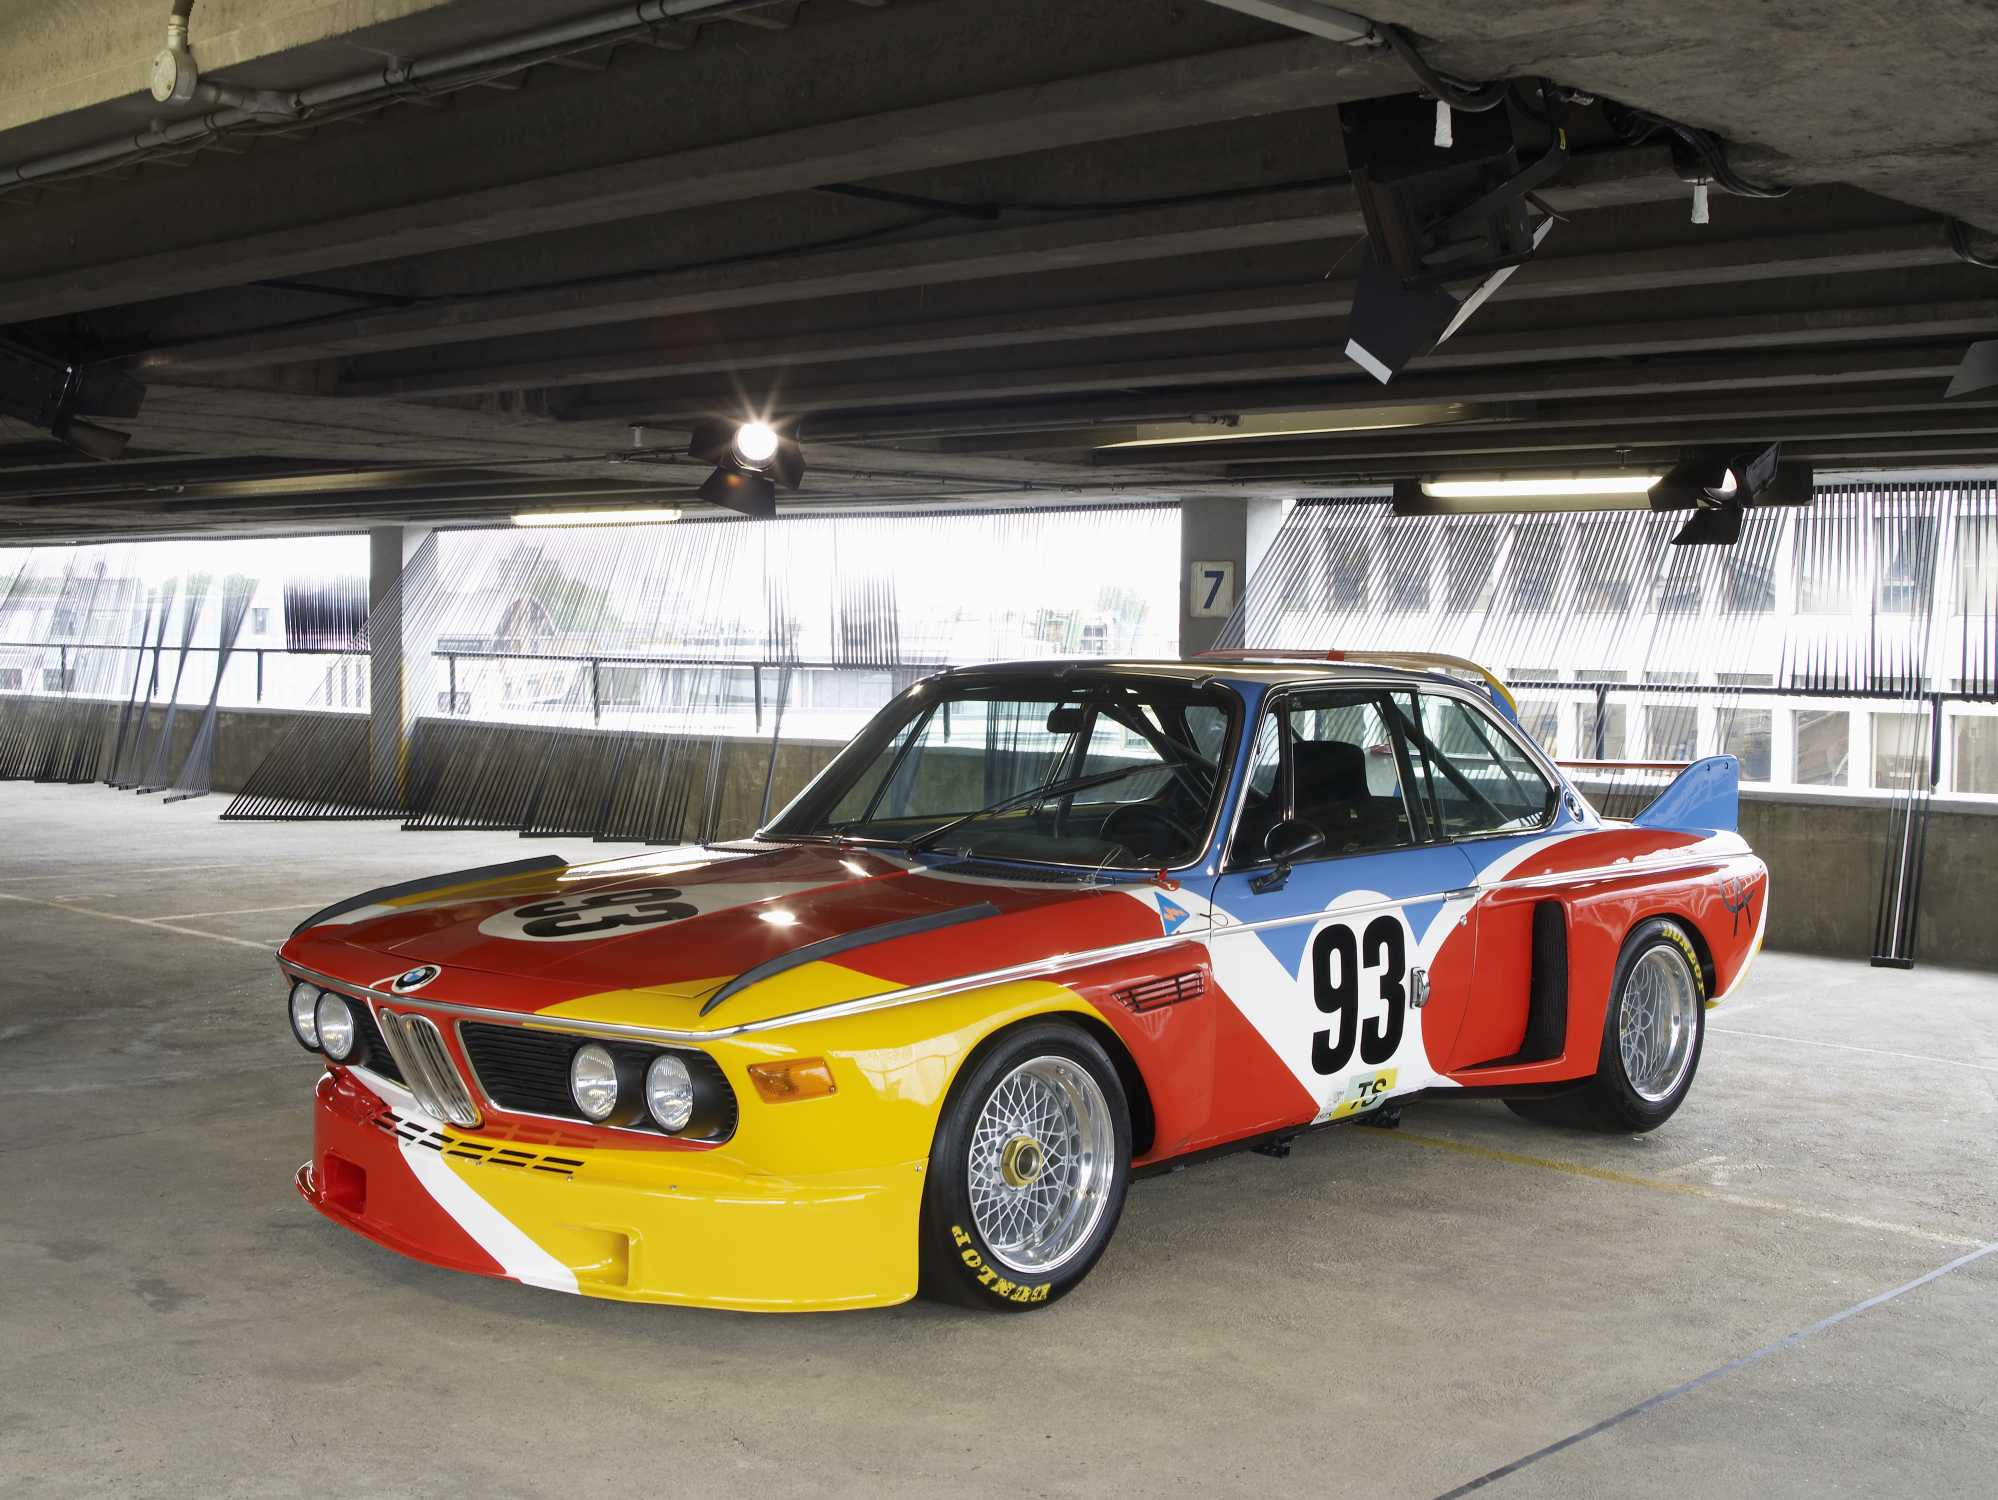 BMW Car Art #1 - BMW 3.0 CSL Alexander Calder - Immagine Artcarbmw.com